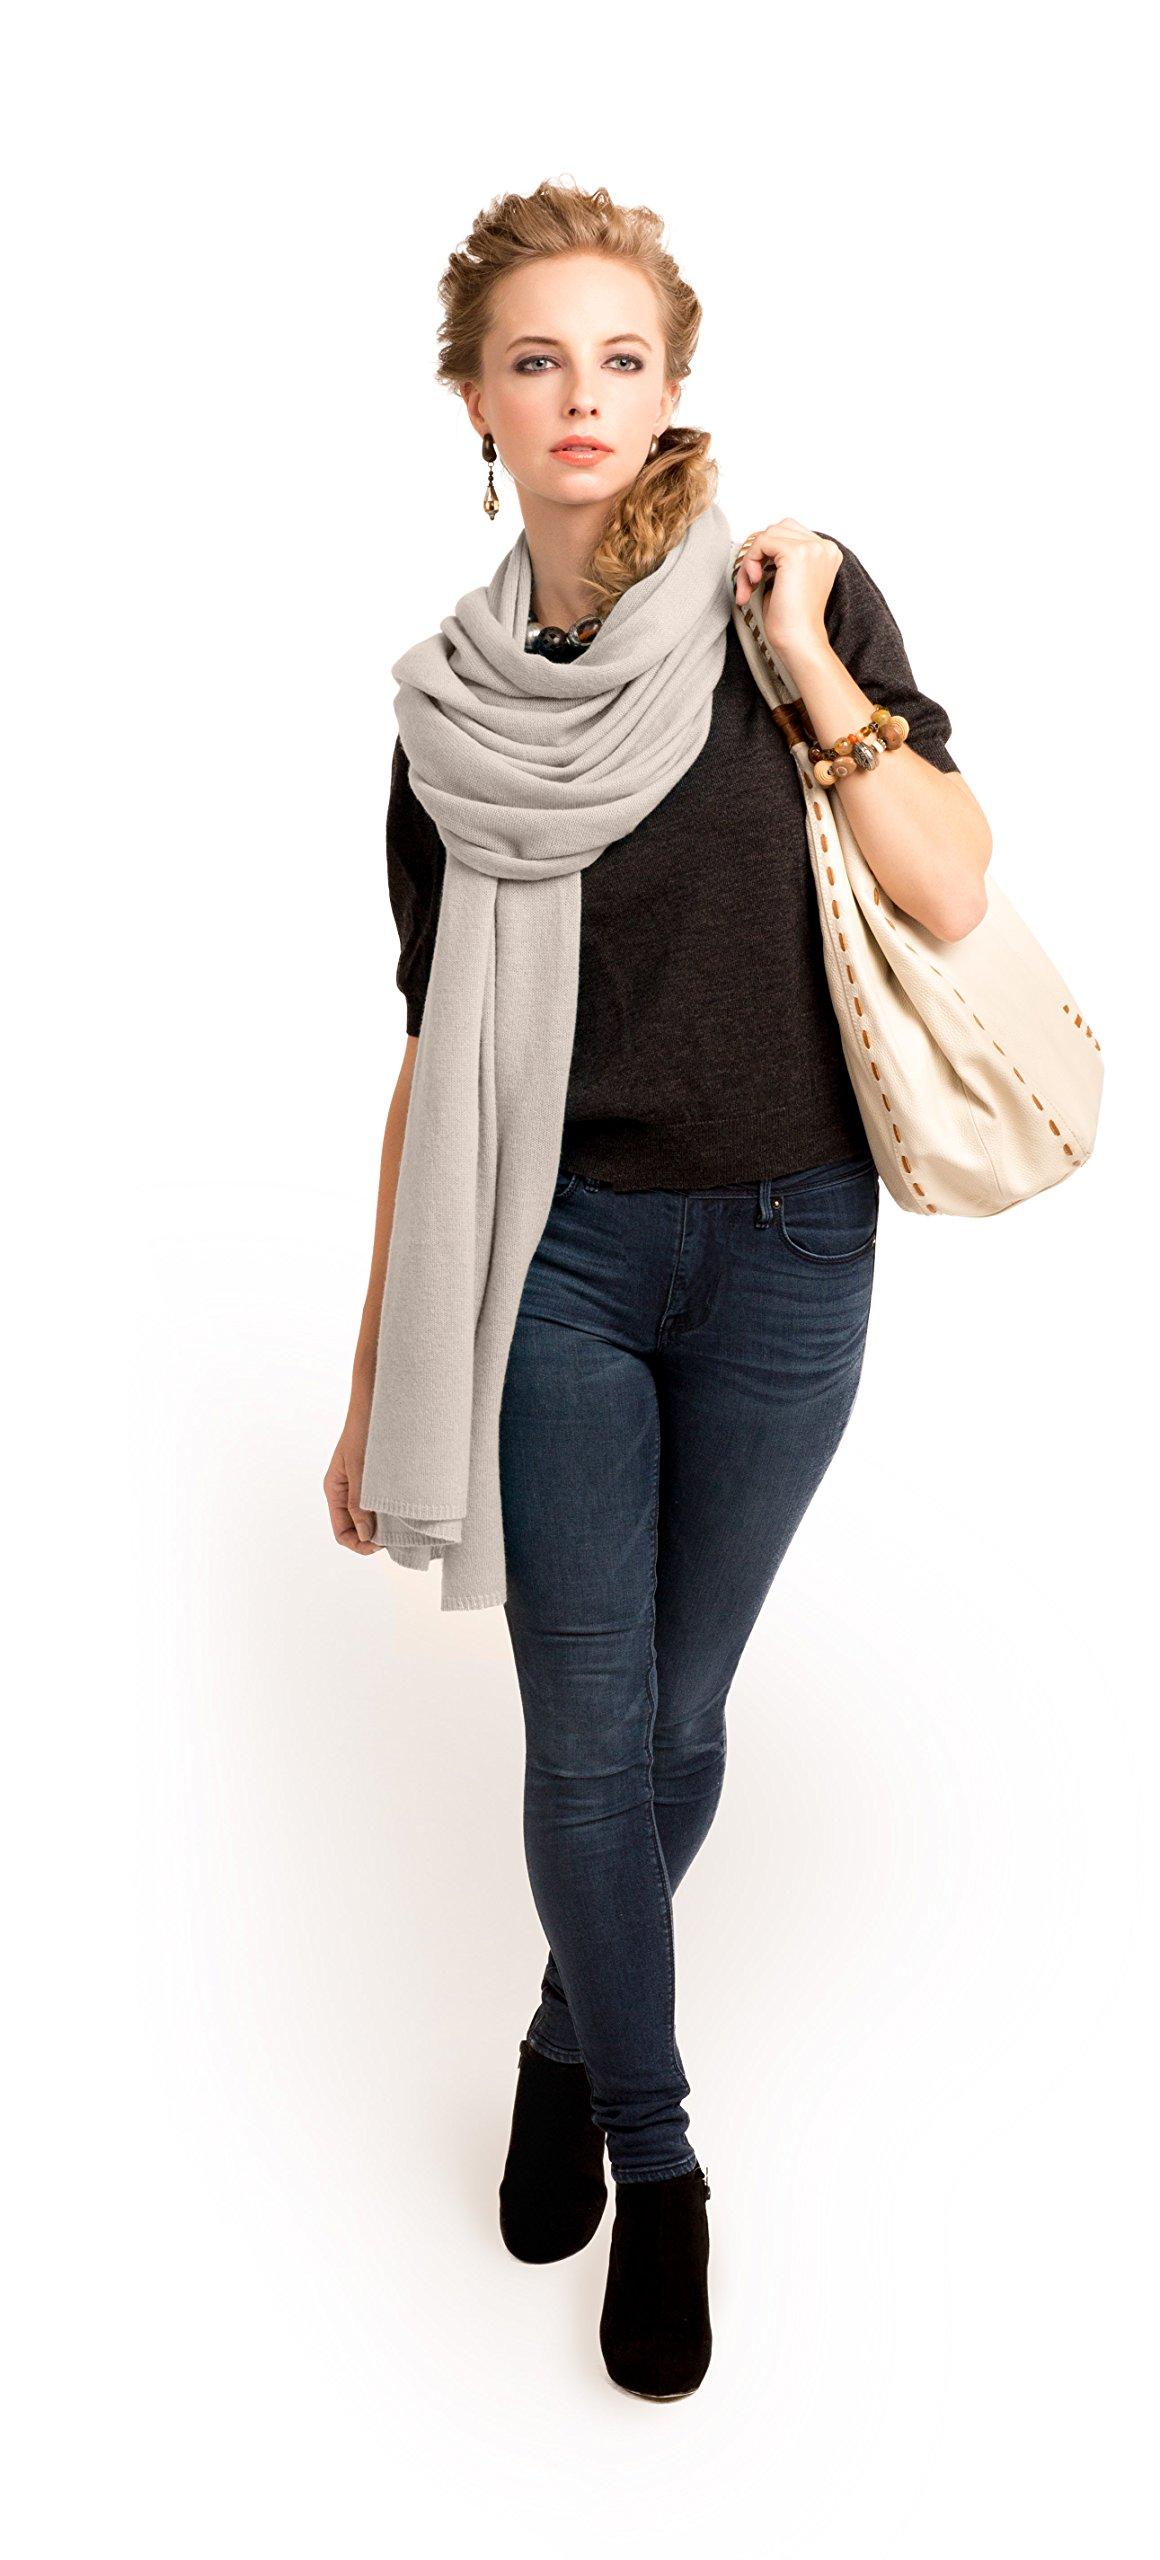 Super Soft Oversized 100% Cashmere Travel Blanket Scarf Wrap - Light Latte